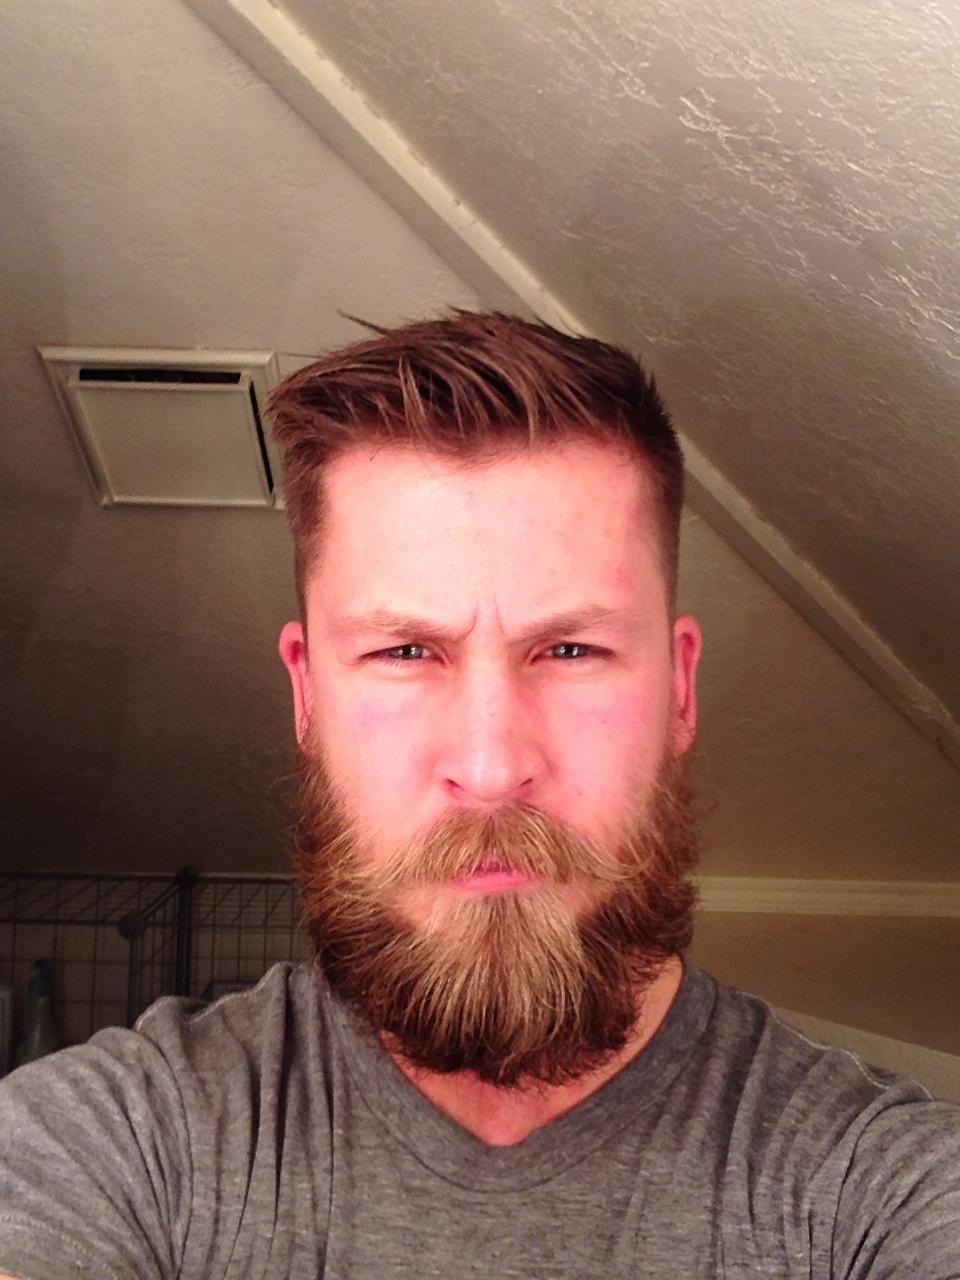 What's beardcare products do you use? Shampoos, Balms